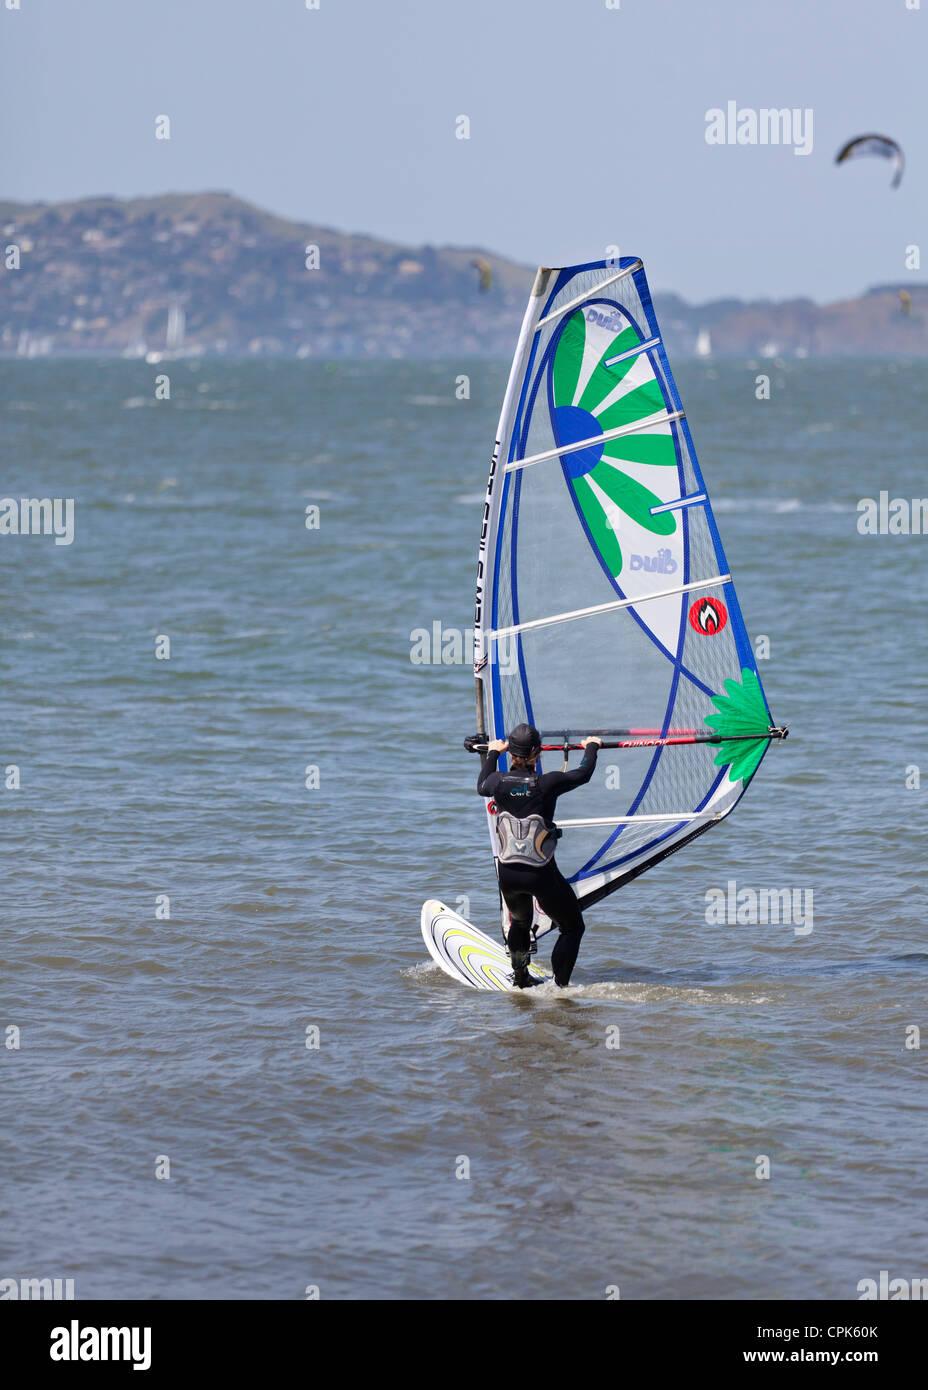 Windsurf en el agua - San Francisco, California, EE.UU. Imagen De Stock